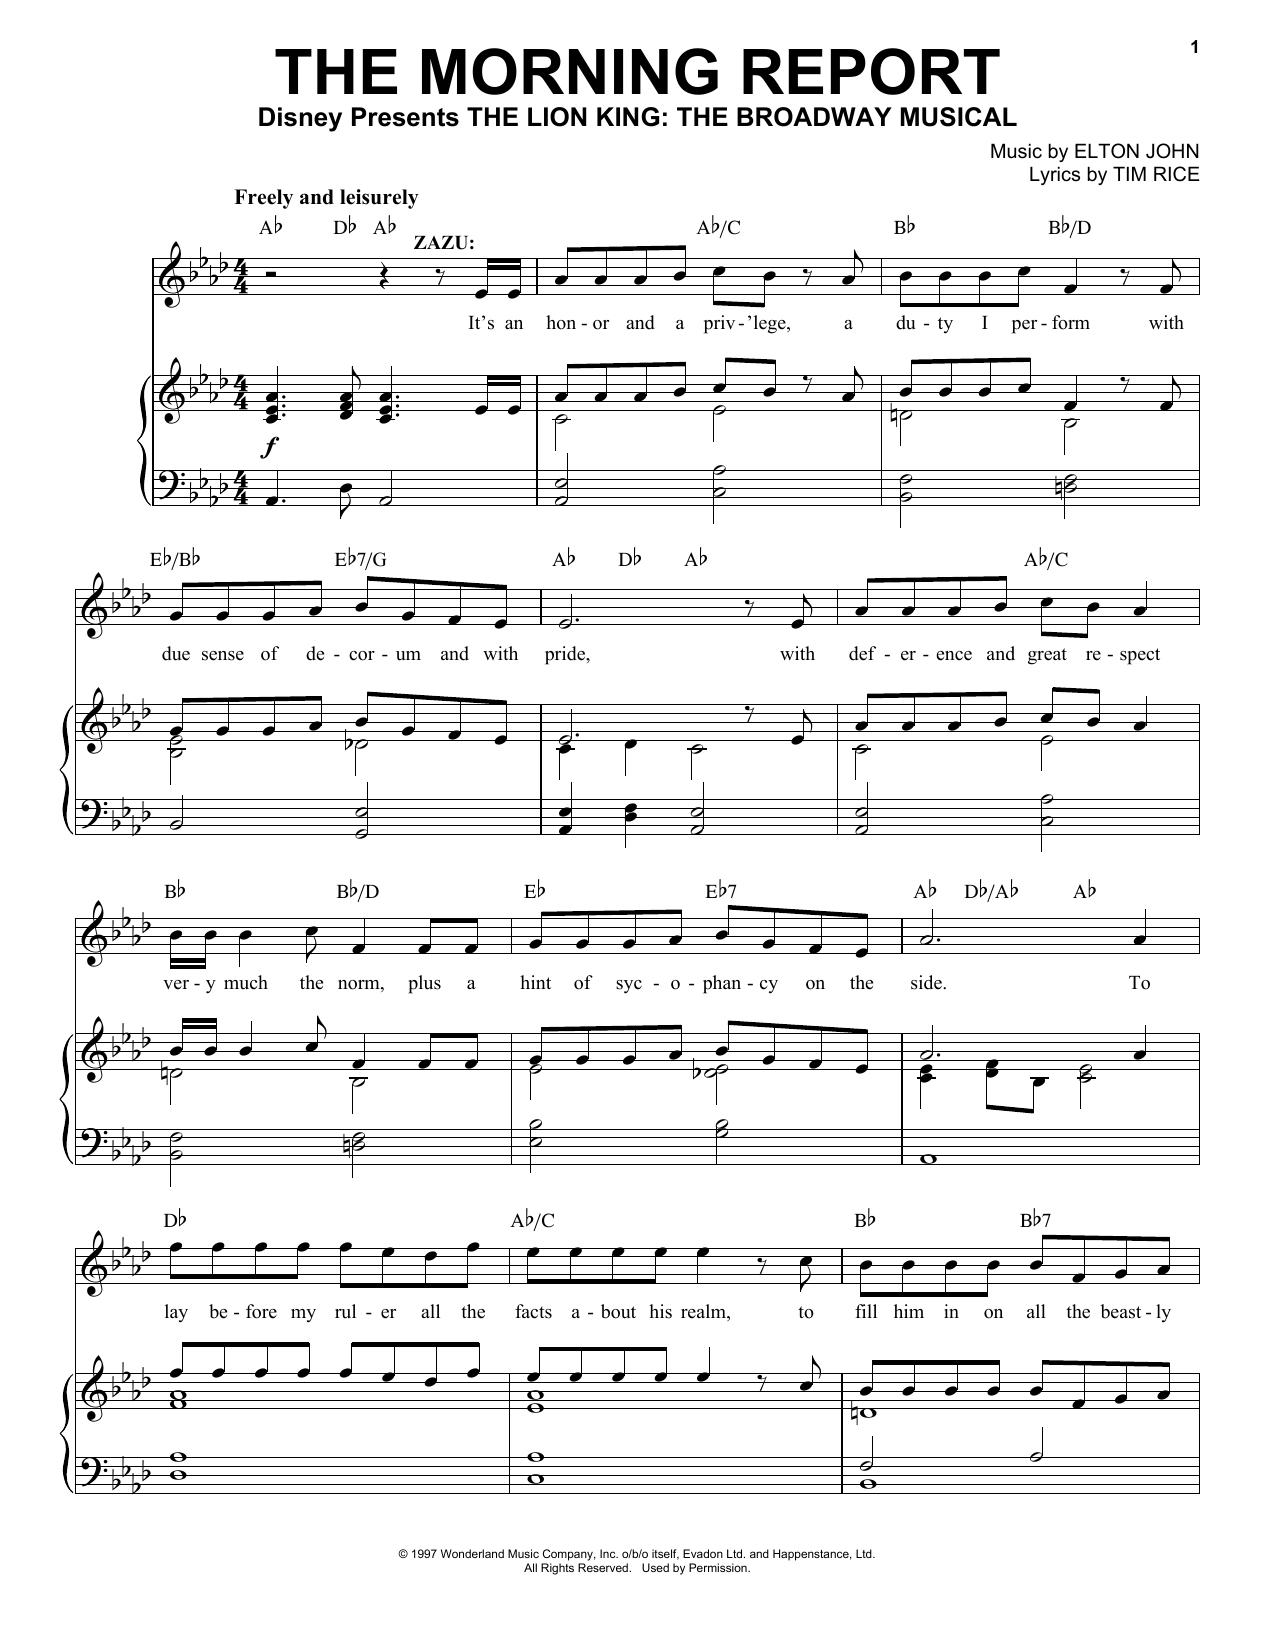 Tiny Dancer Chords Sheet Music Digital Files To Print Licensed Elton John Digital